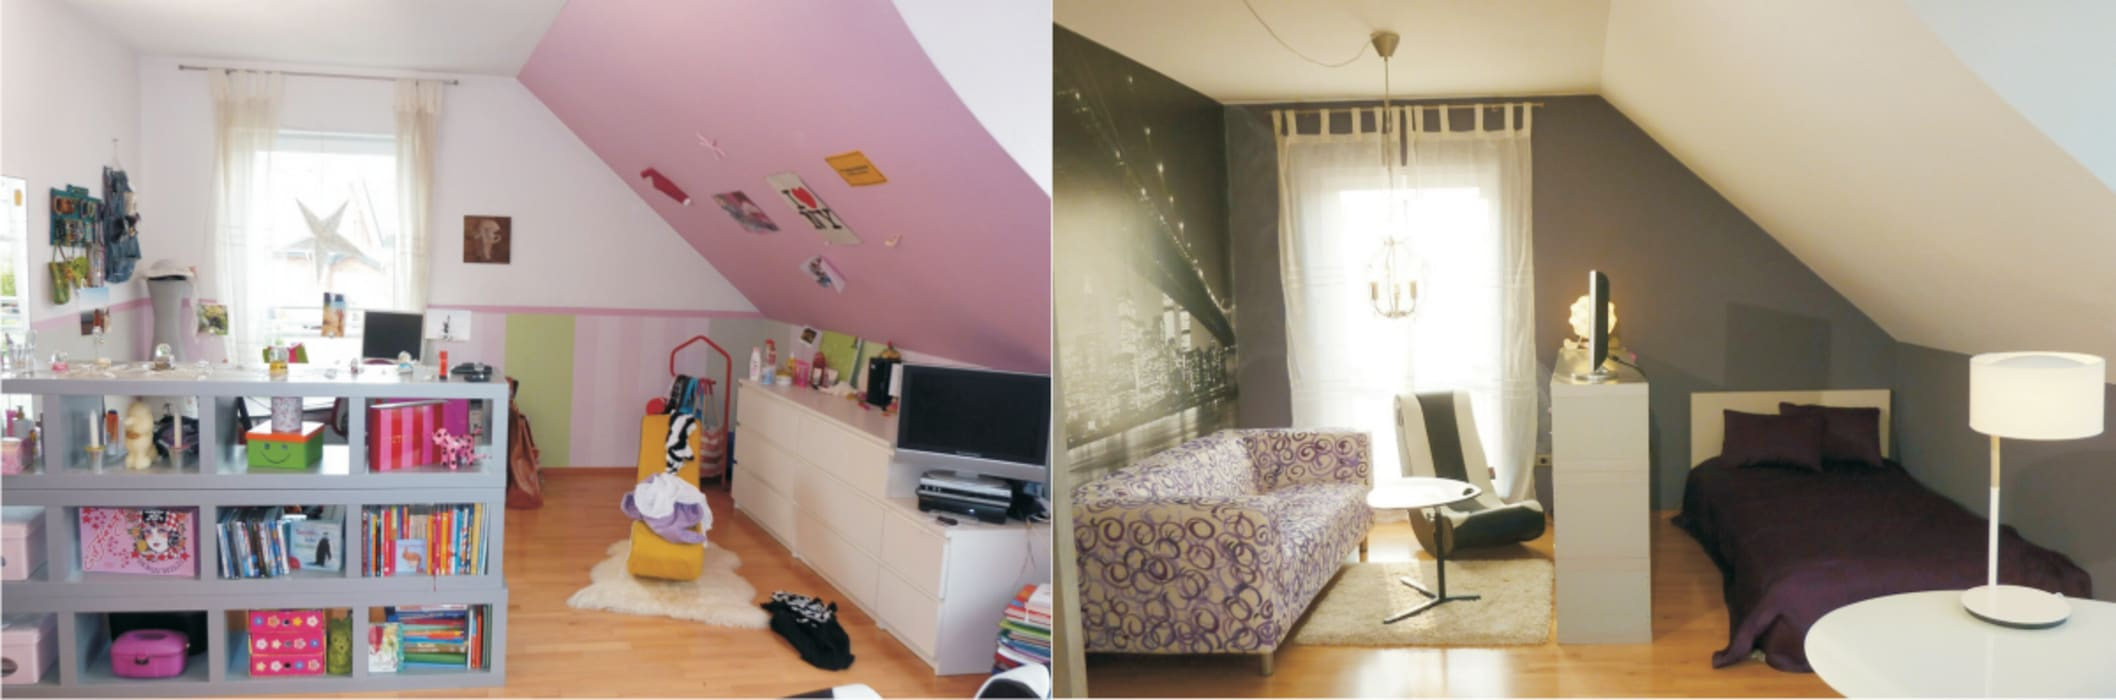 Einrichtungsideen Modern nursery/kids room